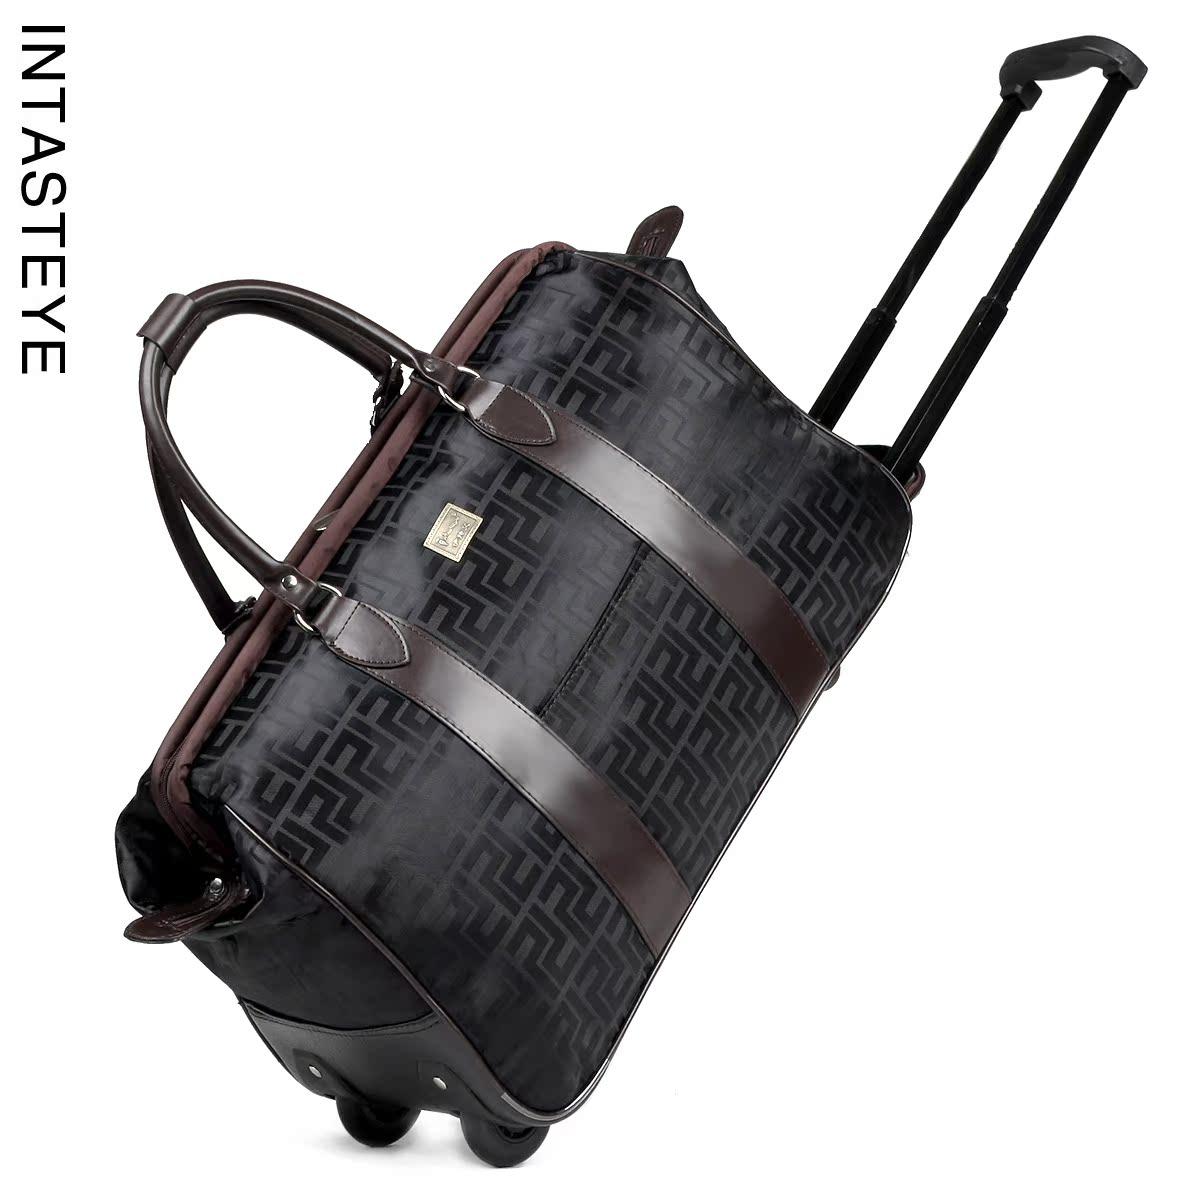 Дорожная сумка Intasteye yi teai gs.fi.7727/2 2013 Intasteye Yi Teai